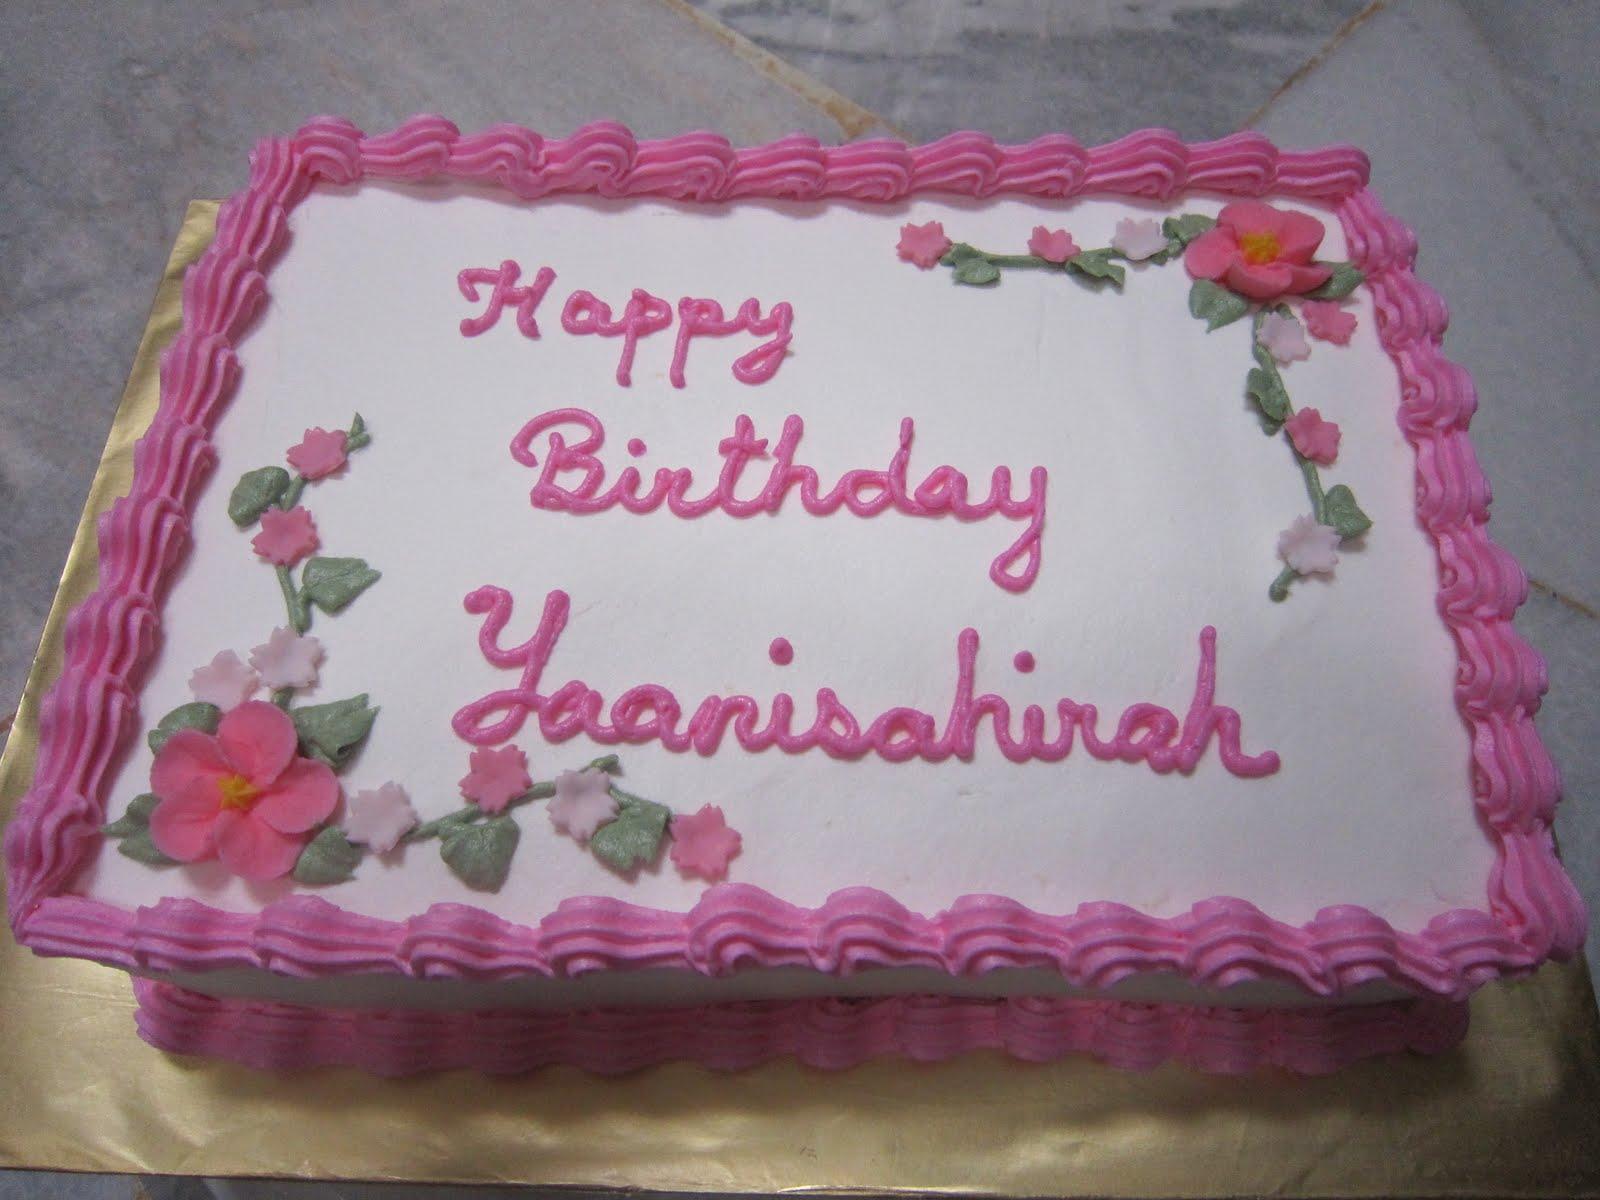 Fondente e crema birthday cakes 2010 birthday cakes 2010 izmirmasajfo